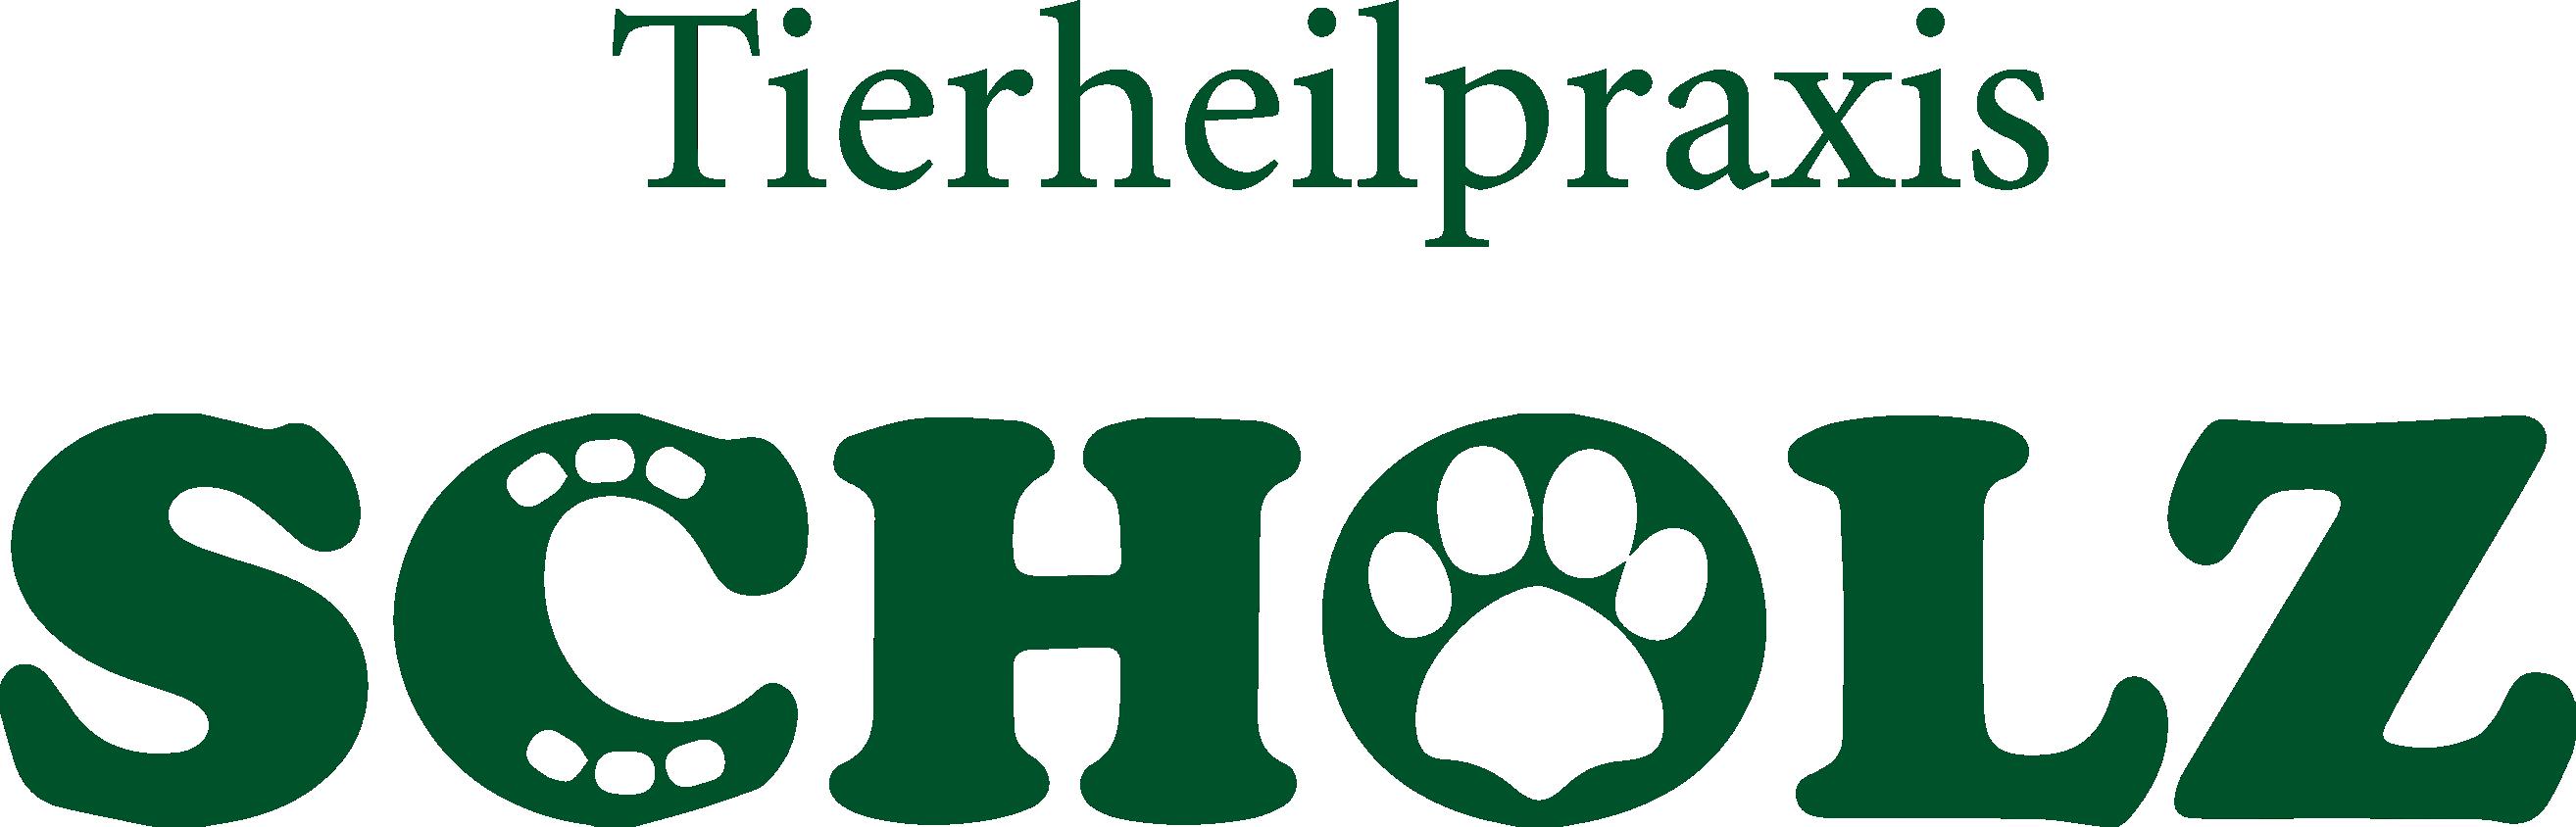 Tierheilpraxis Scholz